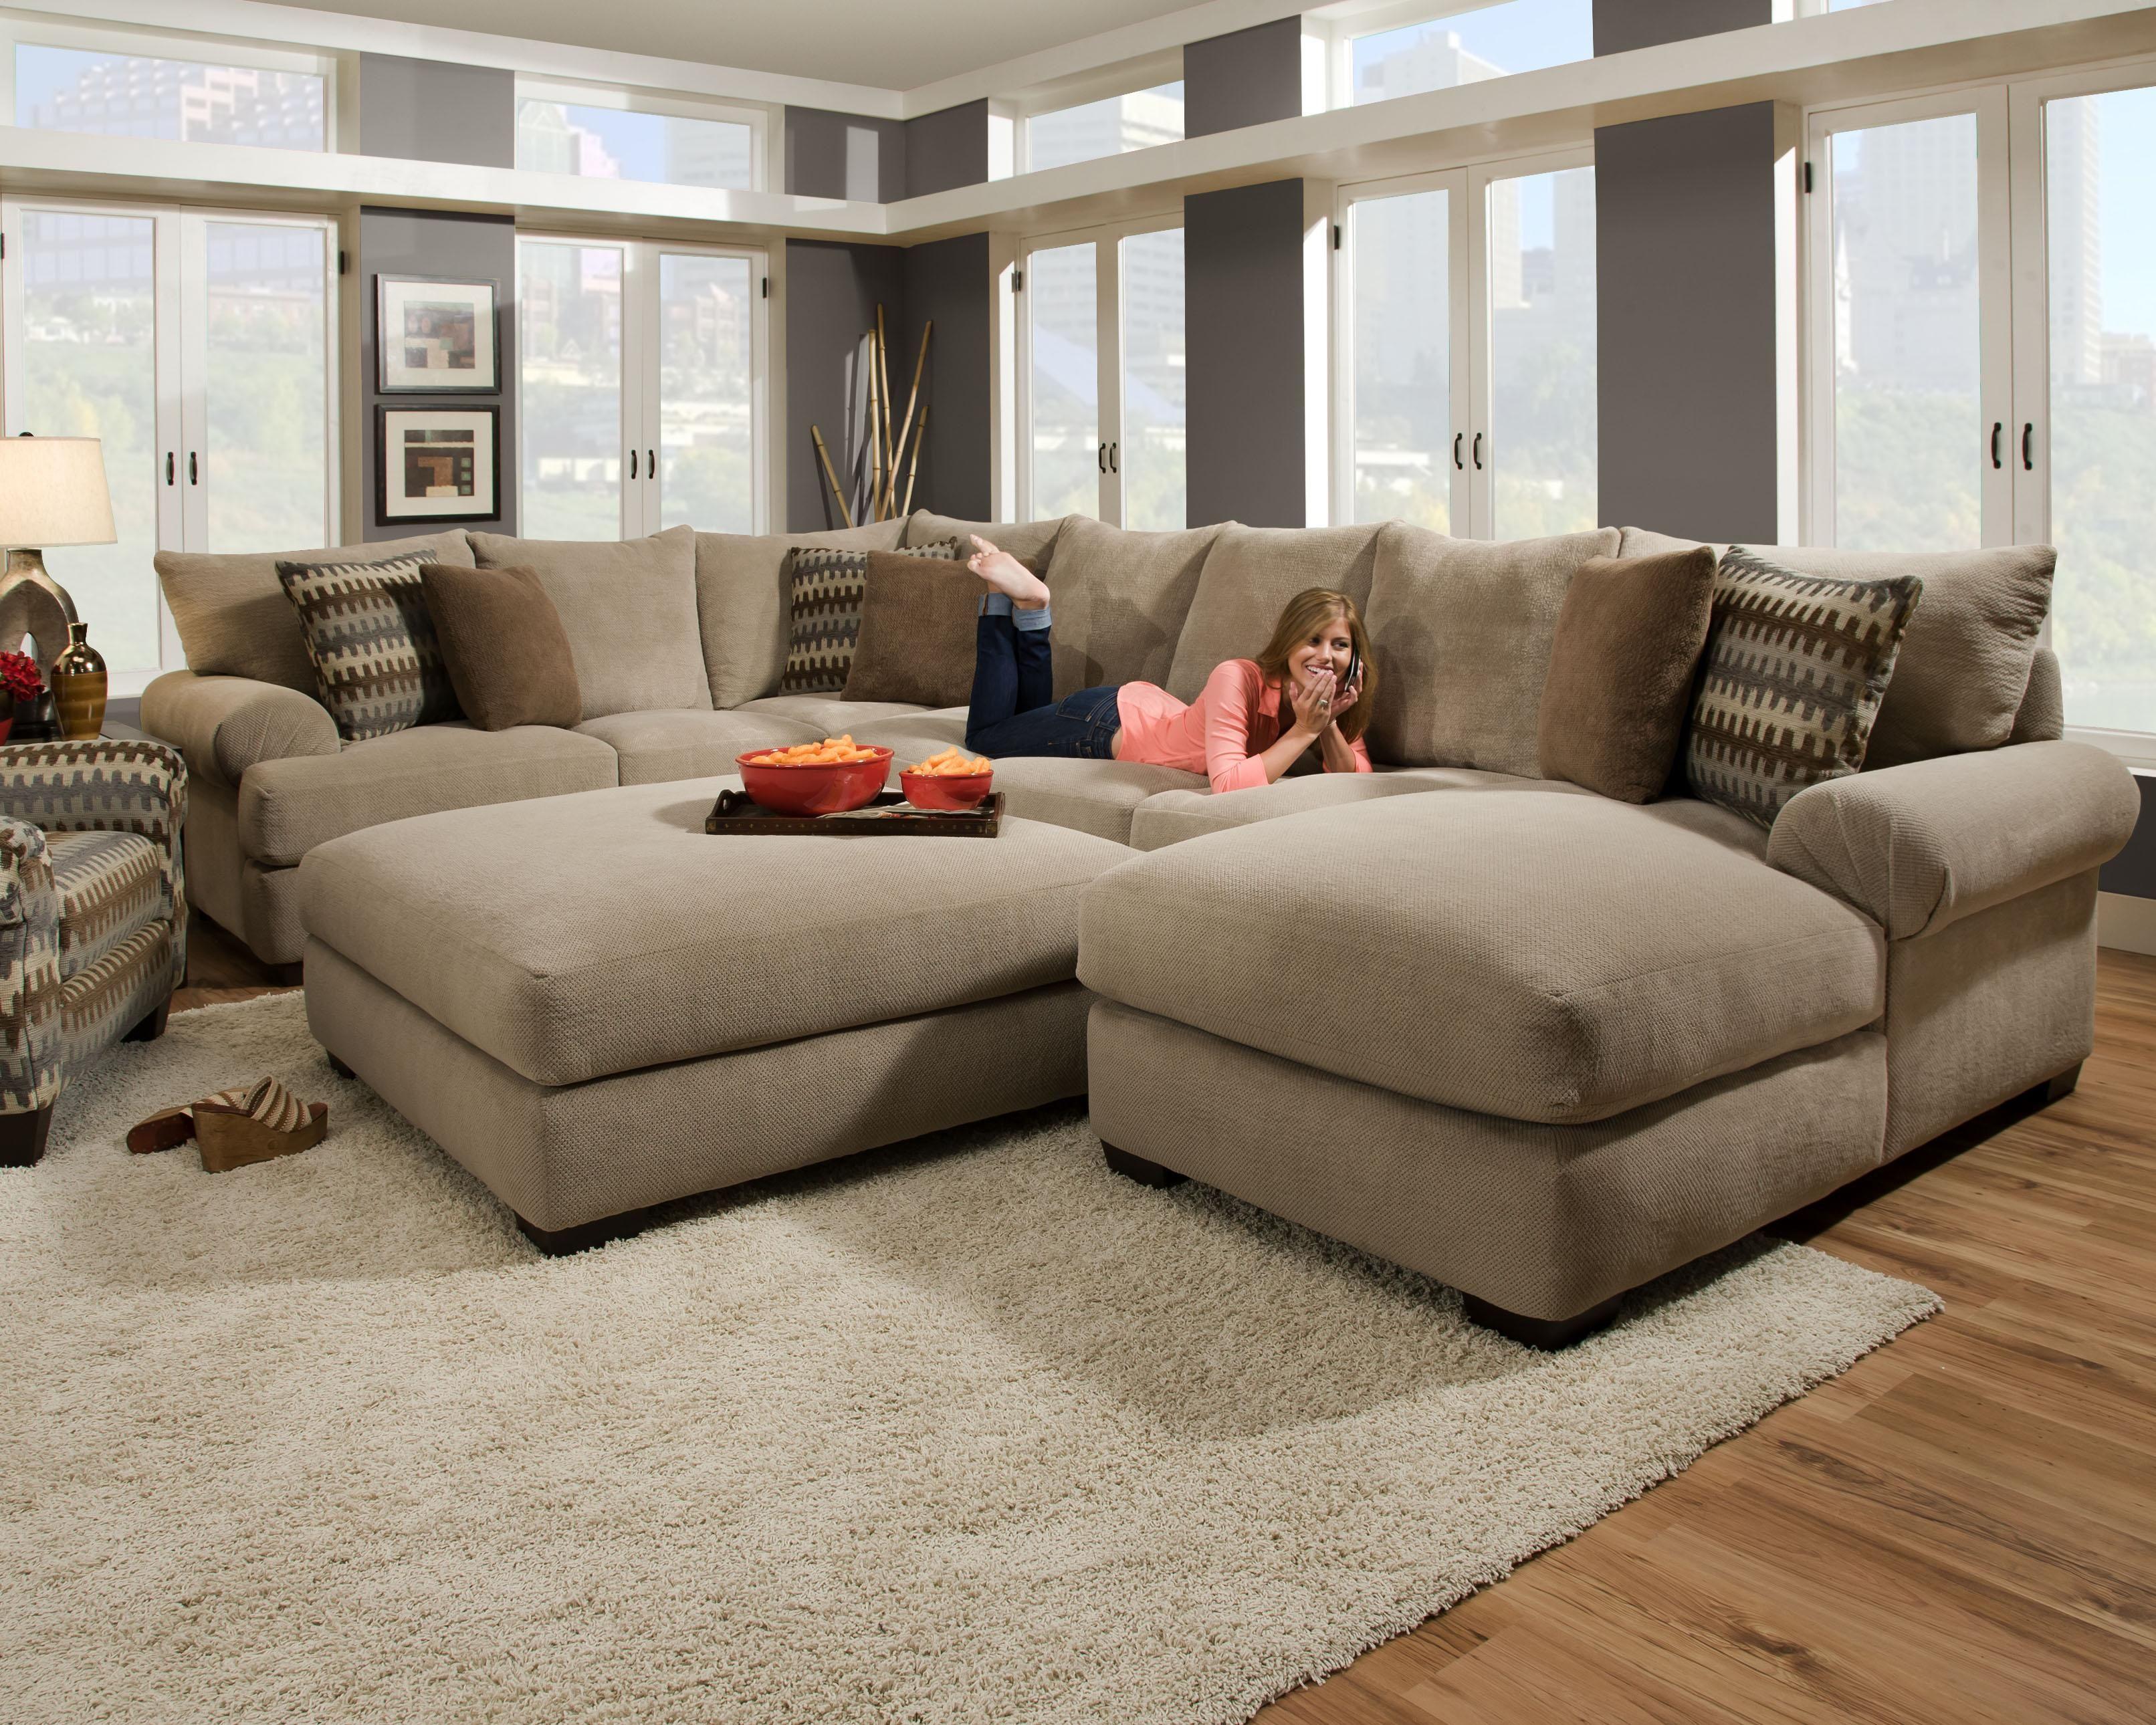 Large Sectional Sofa With Ottoman Comfortable Sectional Sofa